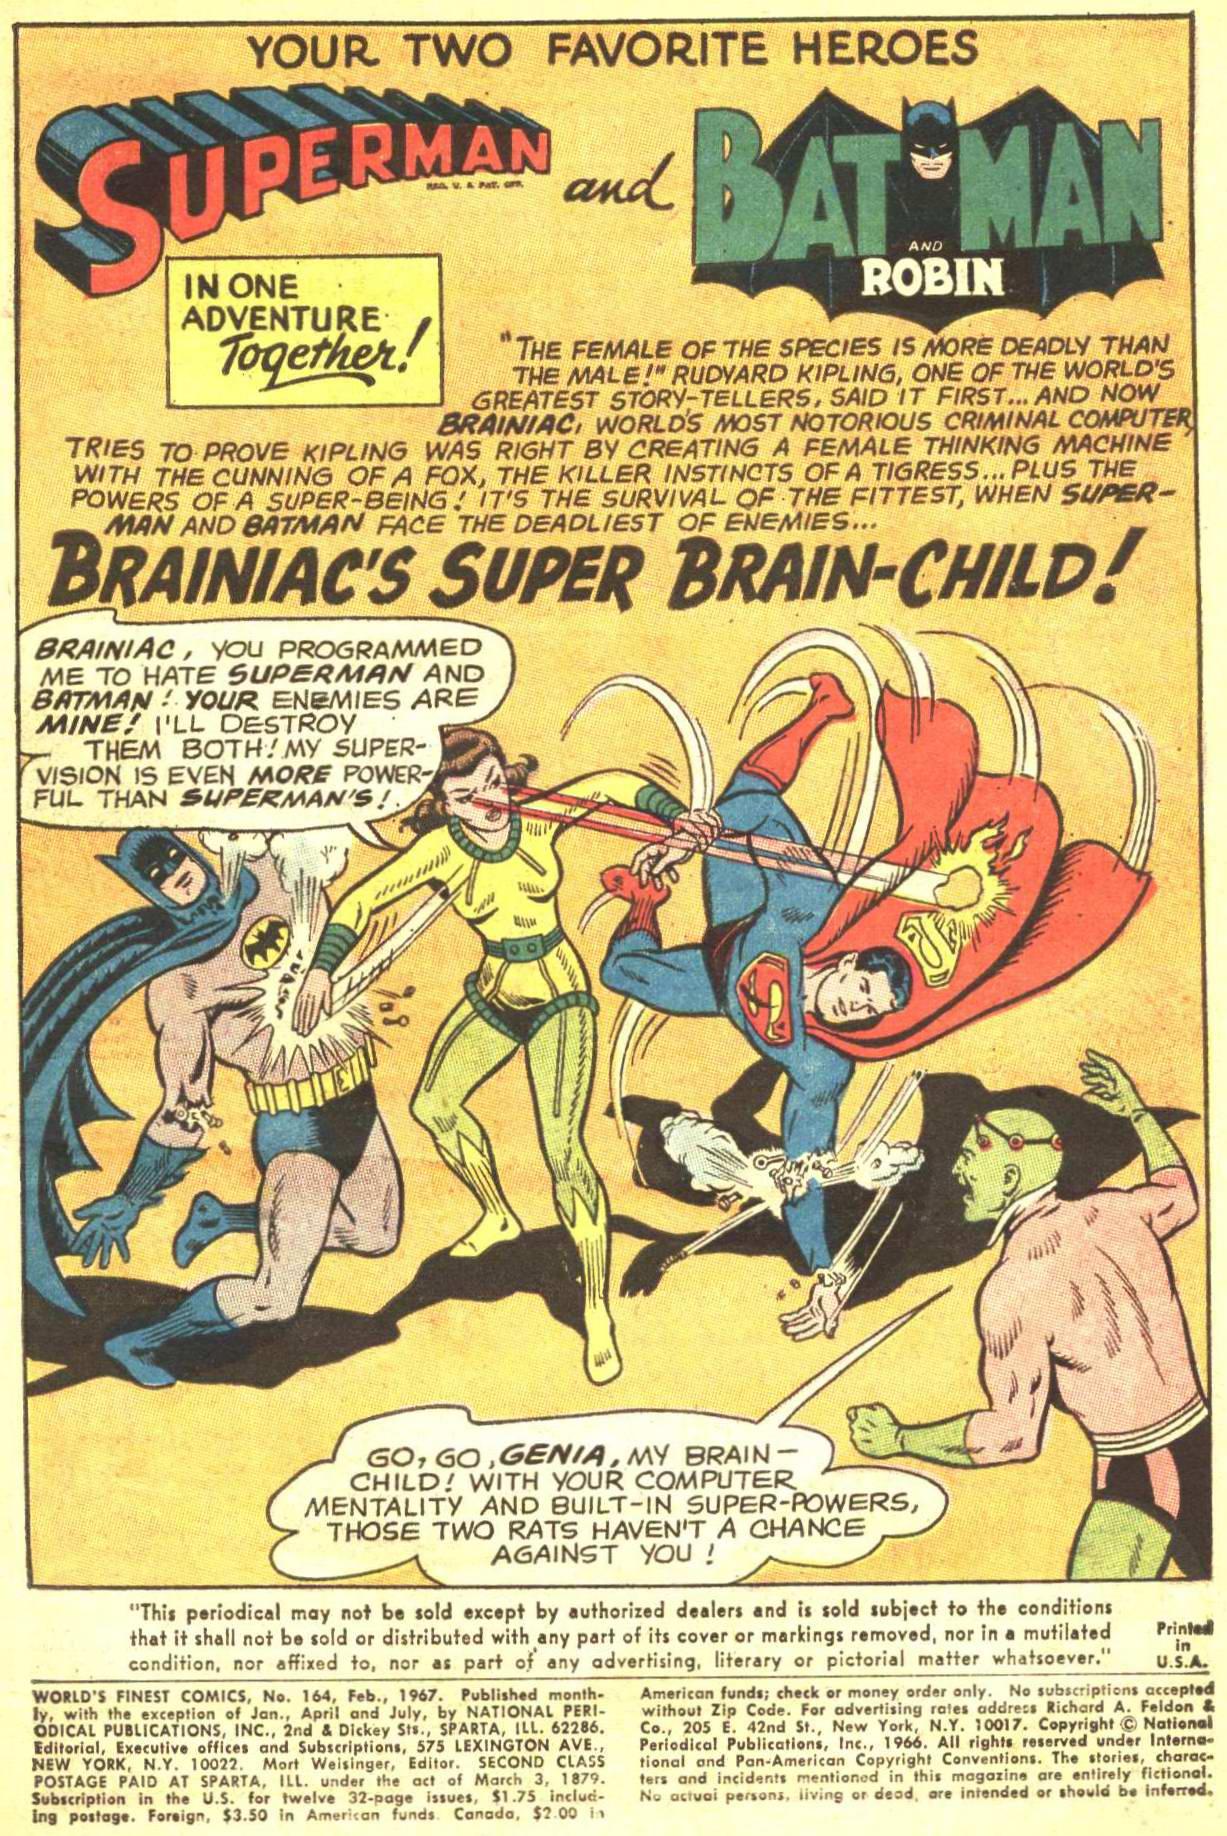 Read online World's Finest Comics comic -  Issue #164 - 3